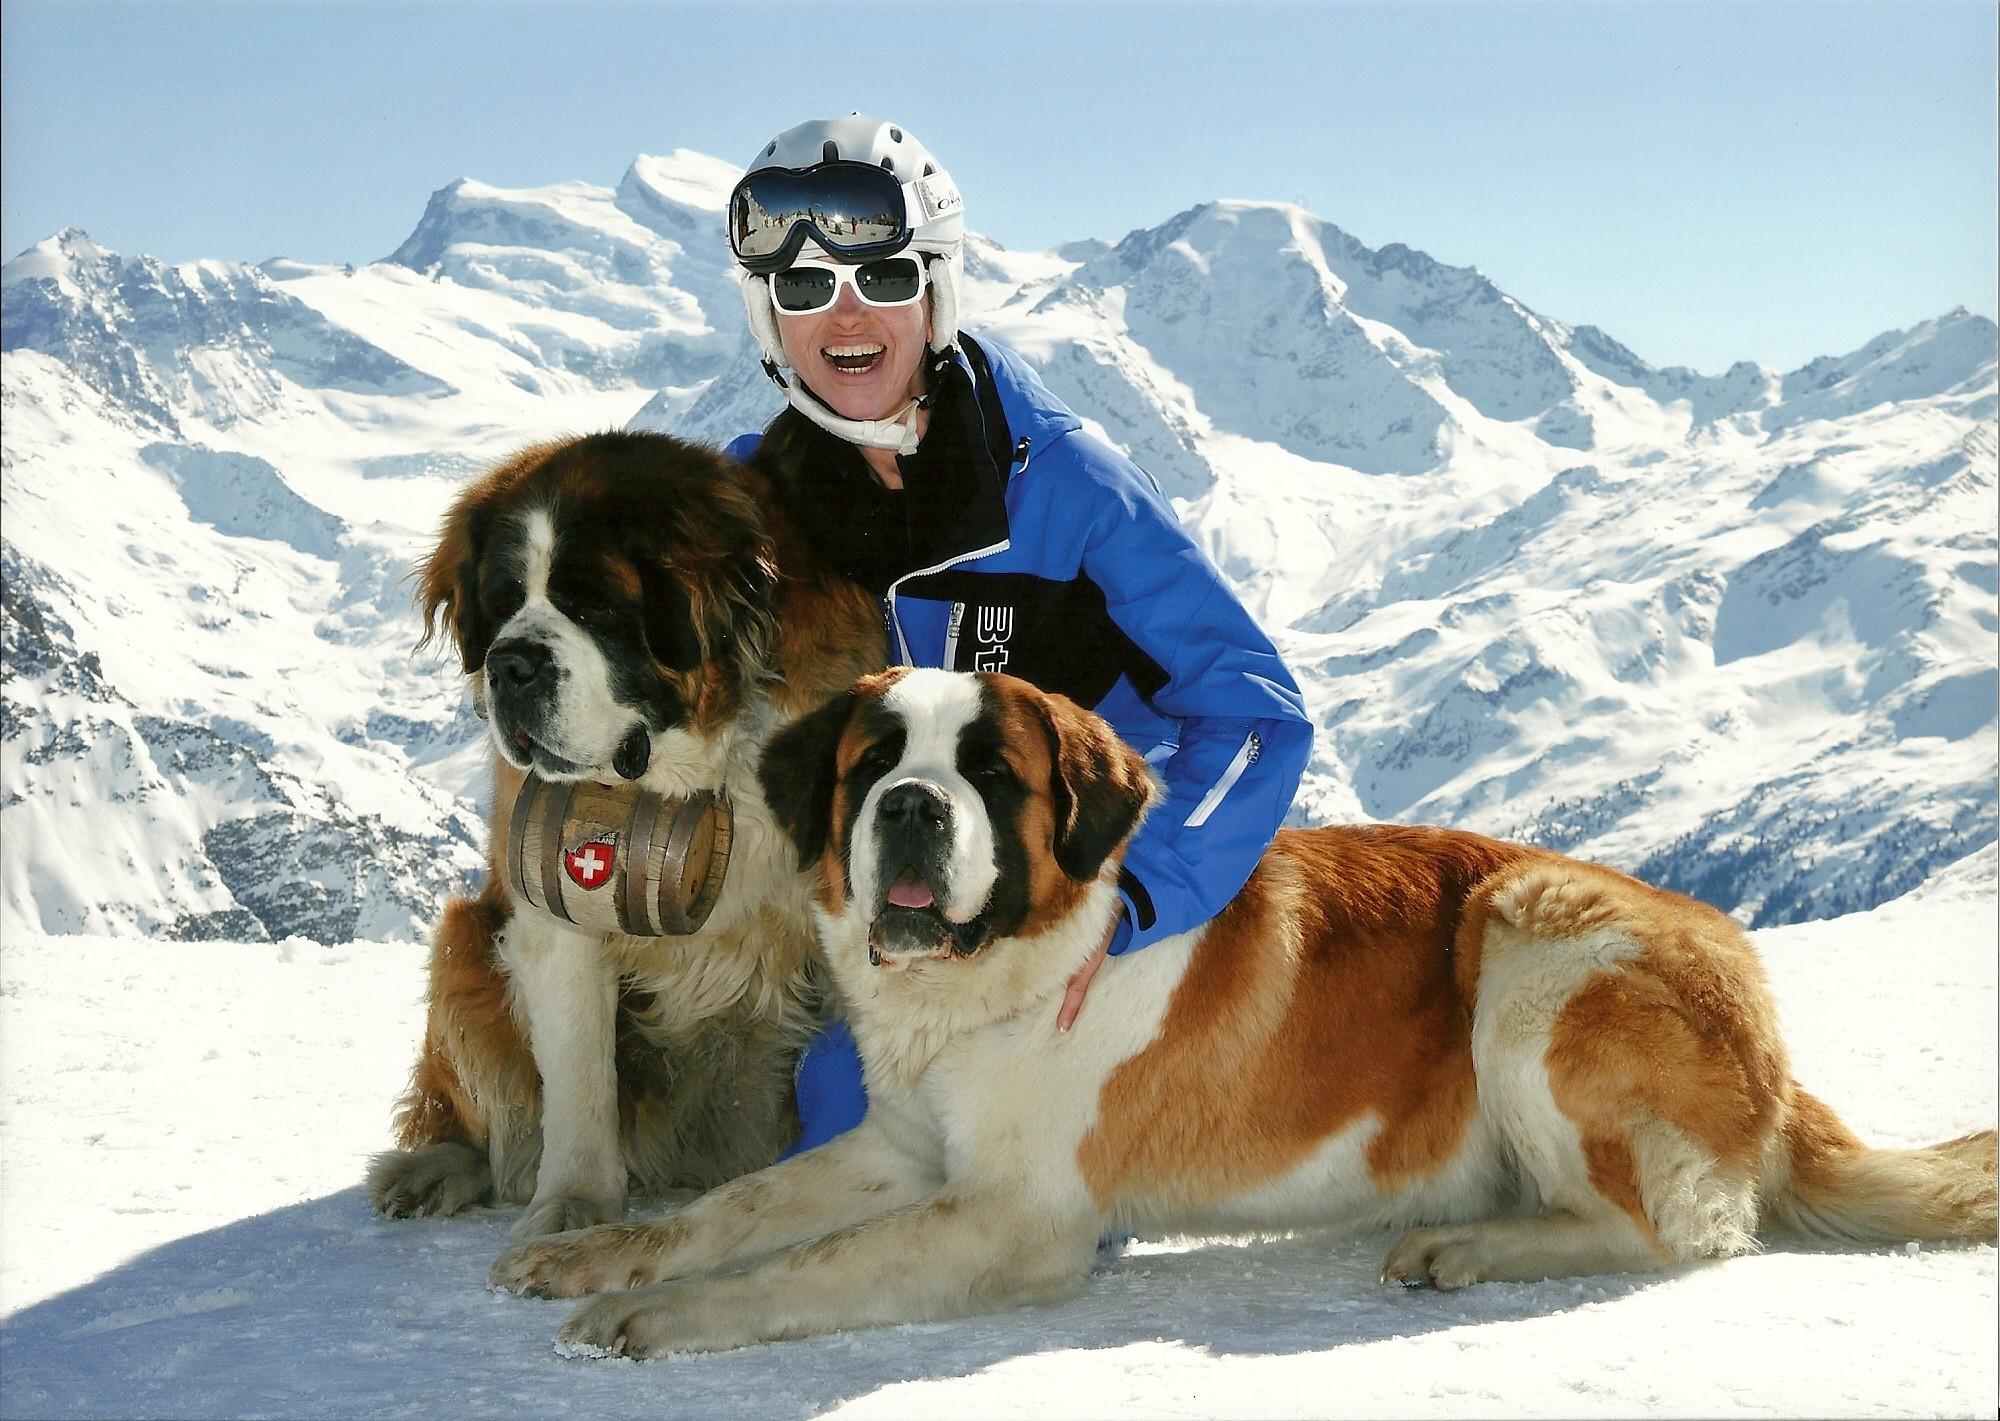 Ski instructor Verbier Martina